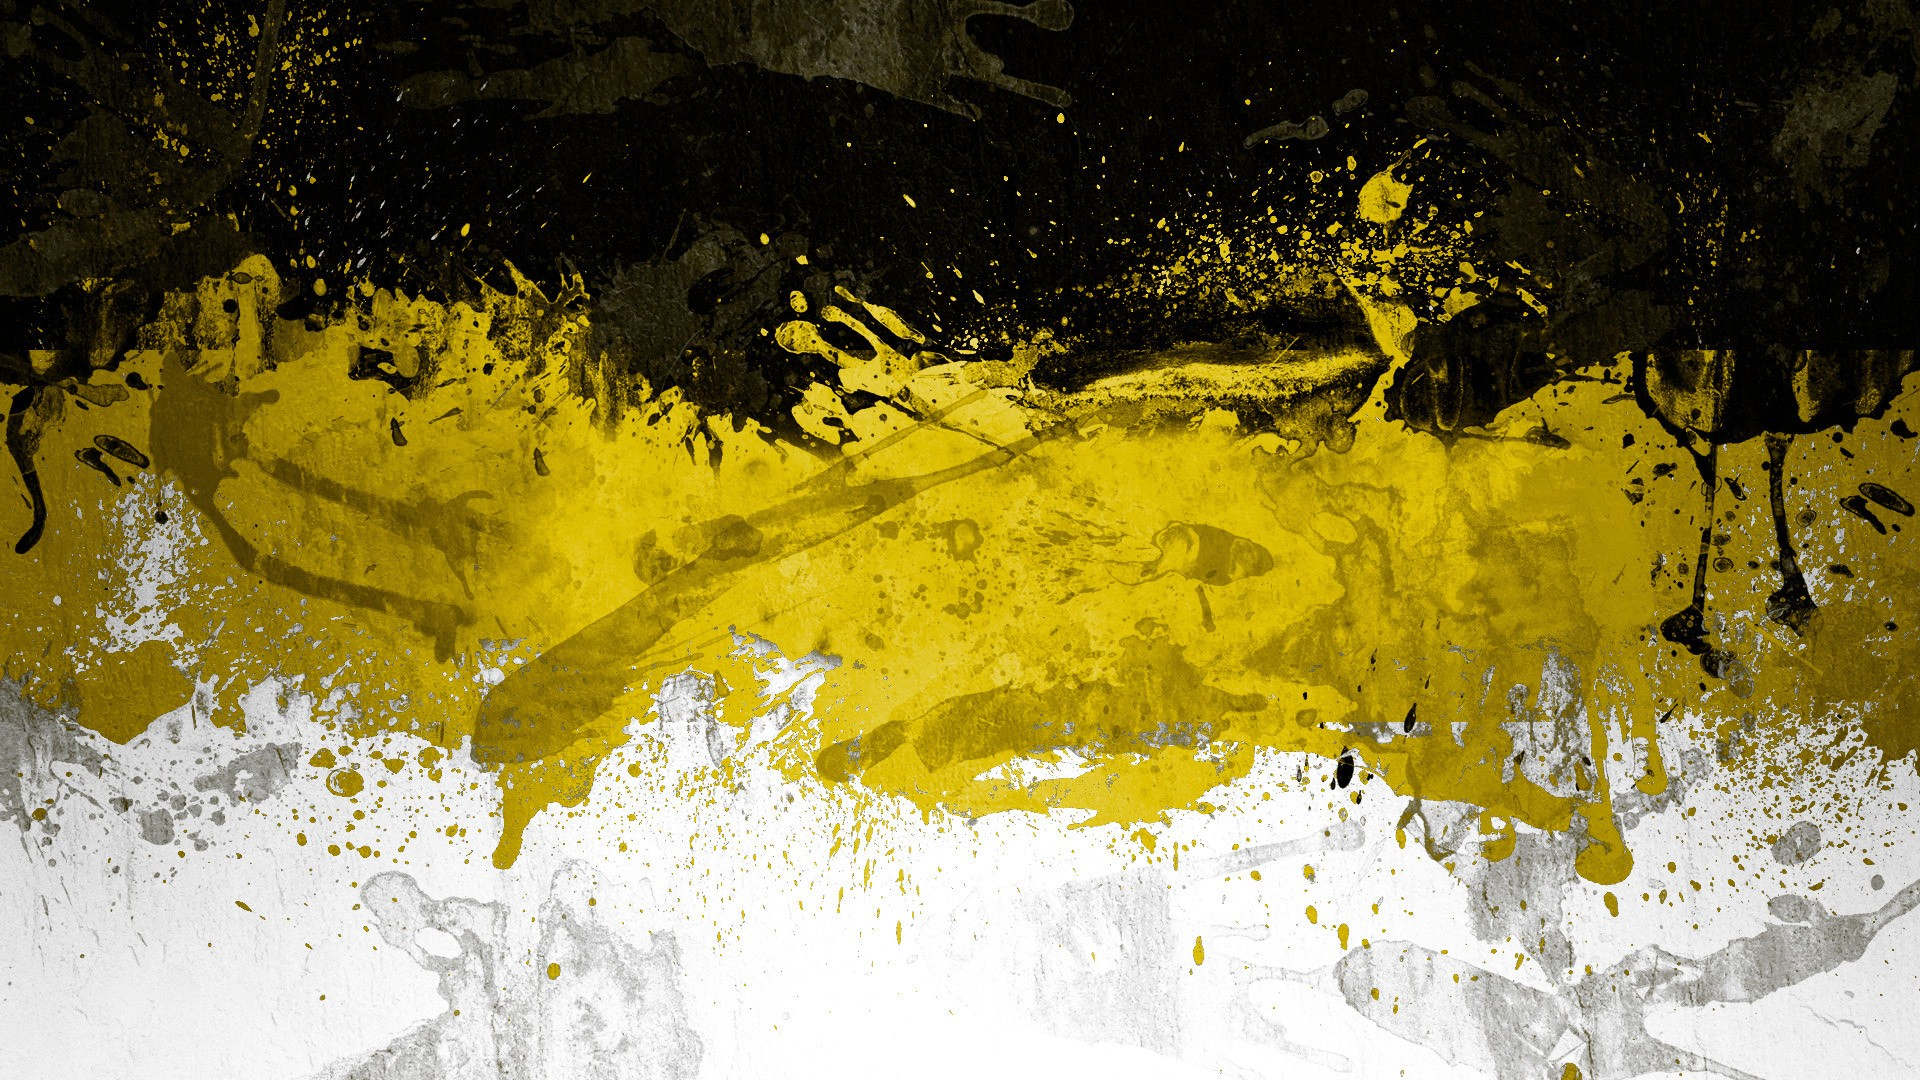 Black White and Yellow Wallpaper  WallpaperSafari